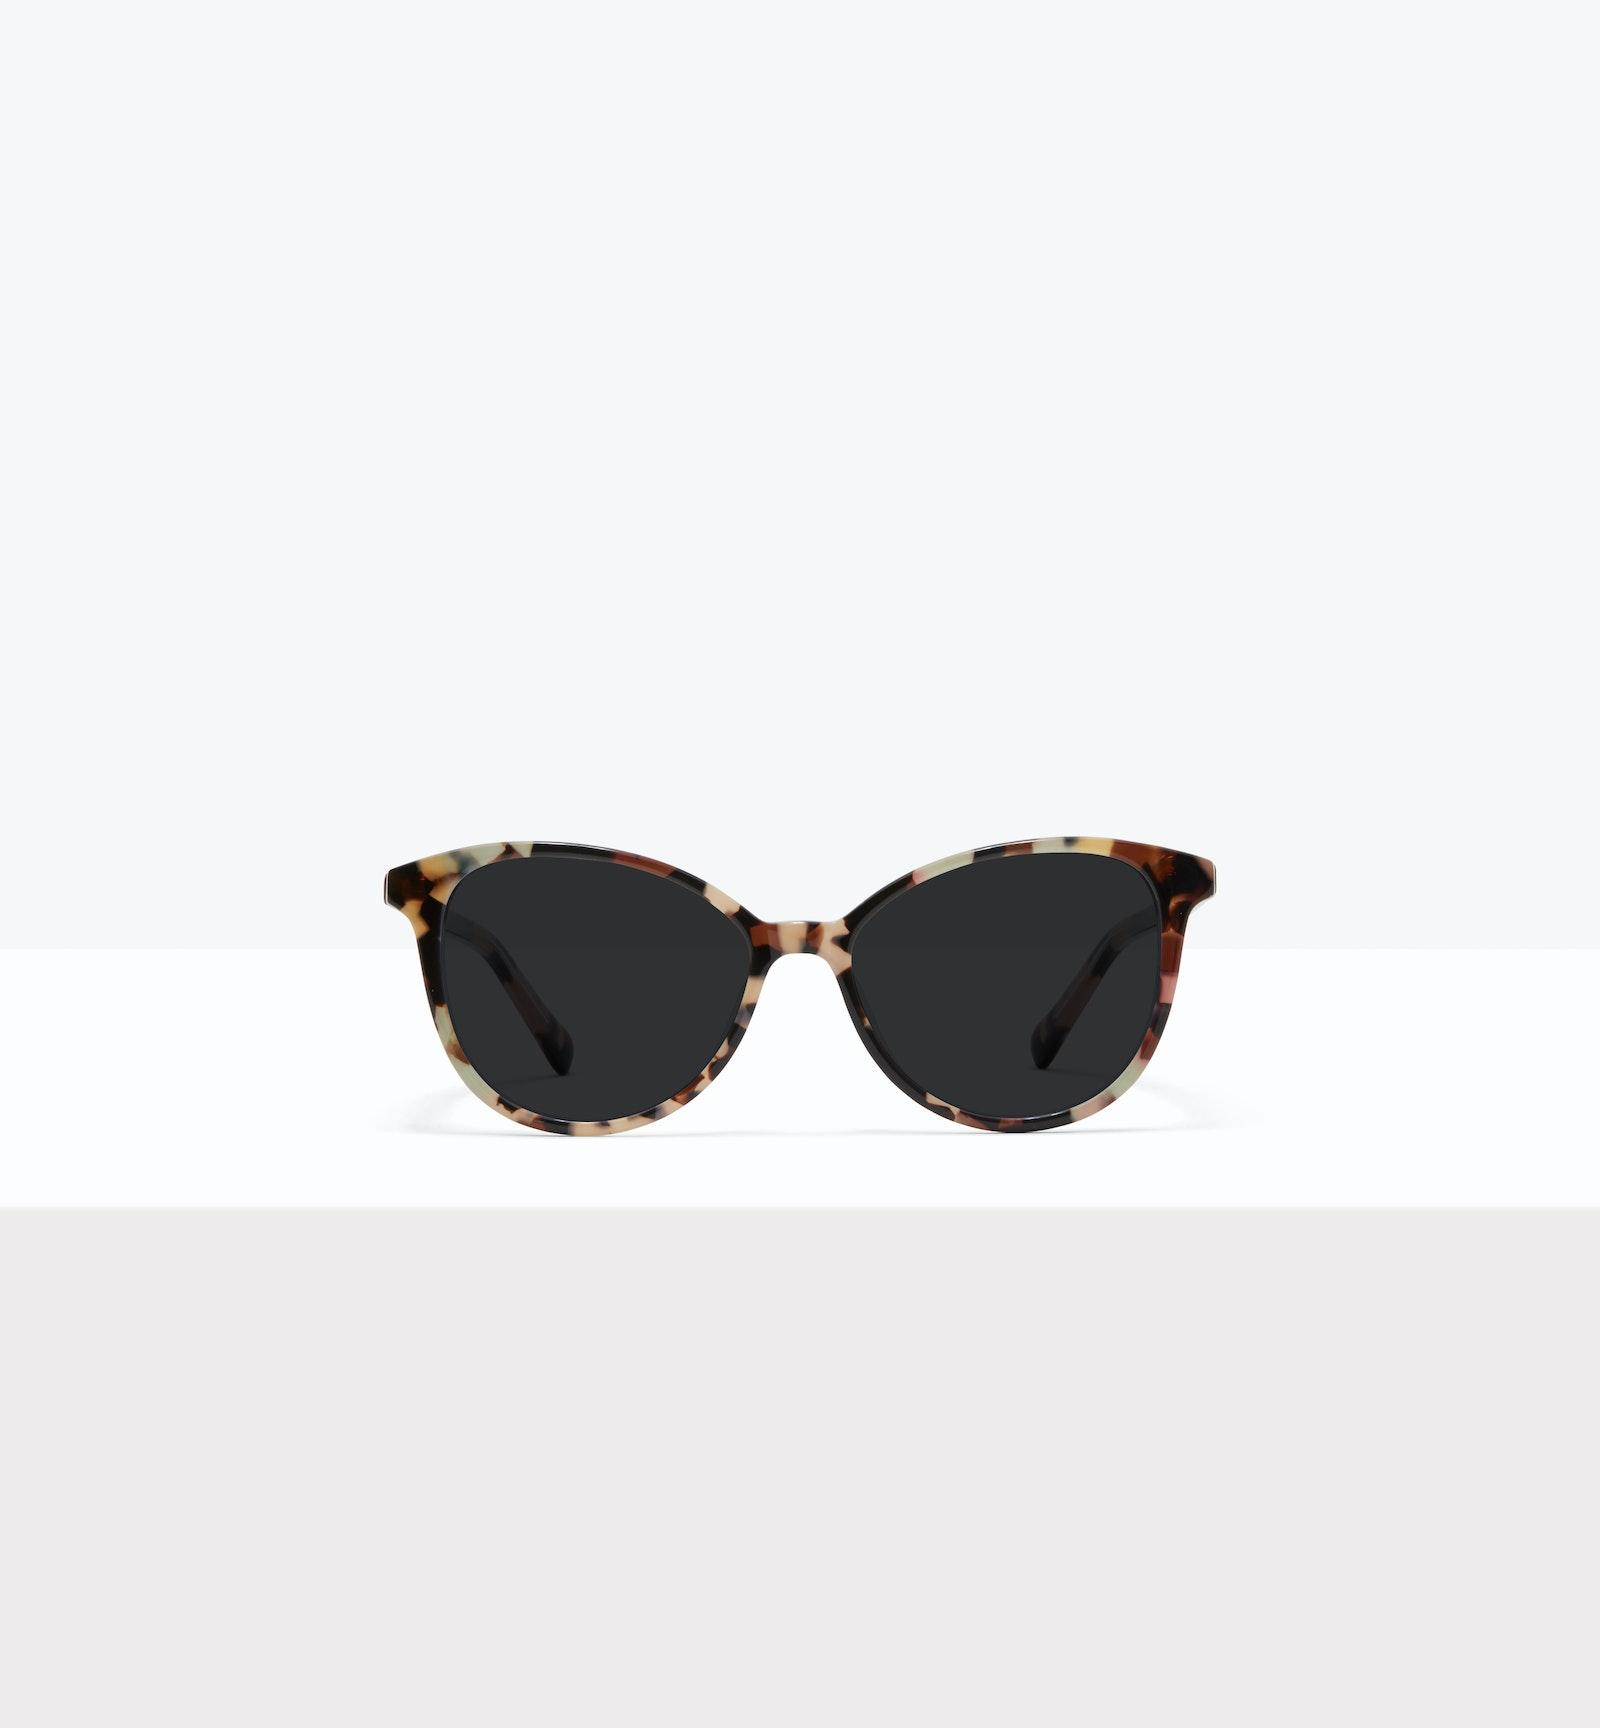 Affordable Fashion Glasses Cat Eye Sunglasses Women Esprit M Pastel Tort